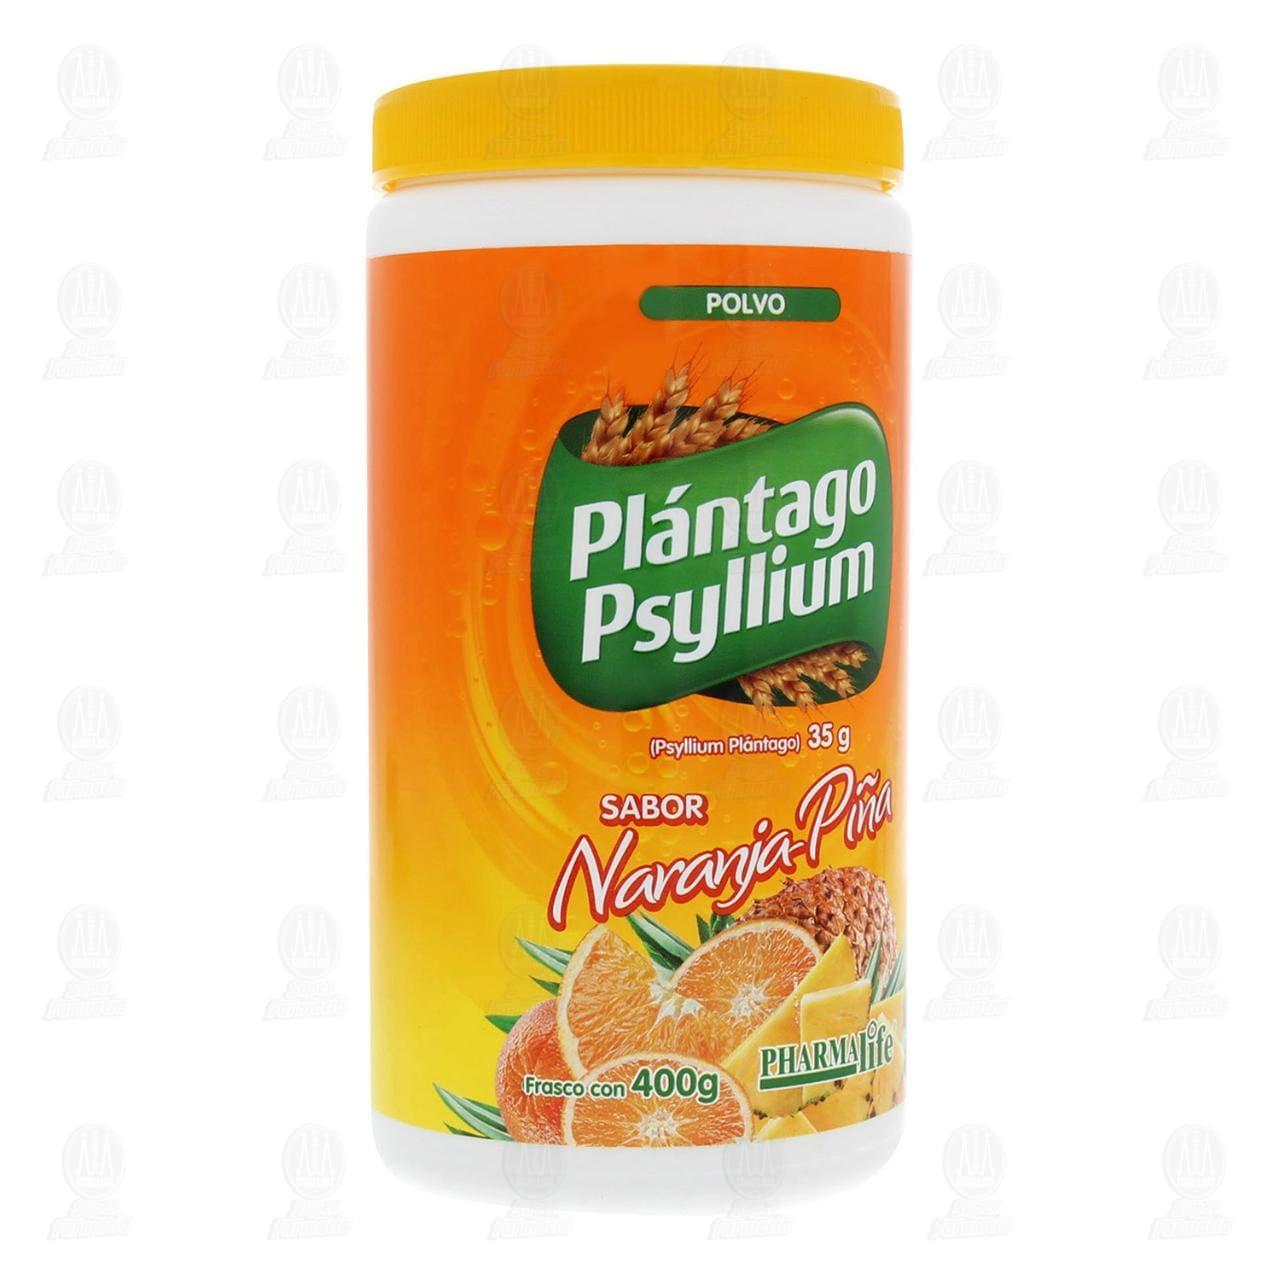 Comprar Plántago Psyllium Sabor Naranja En Polvo 400g Pharmalife en Farmacias Guadalajara